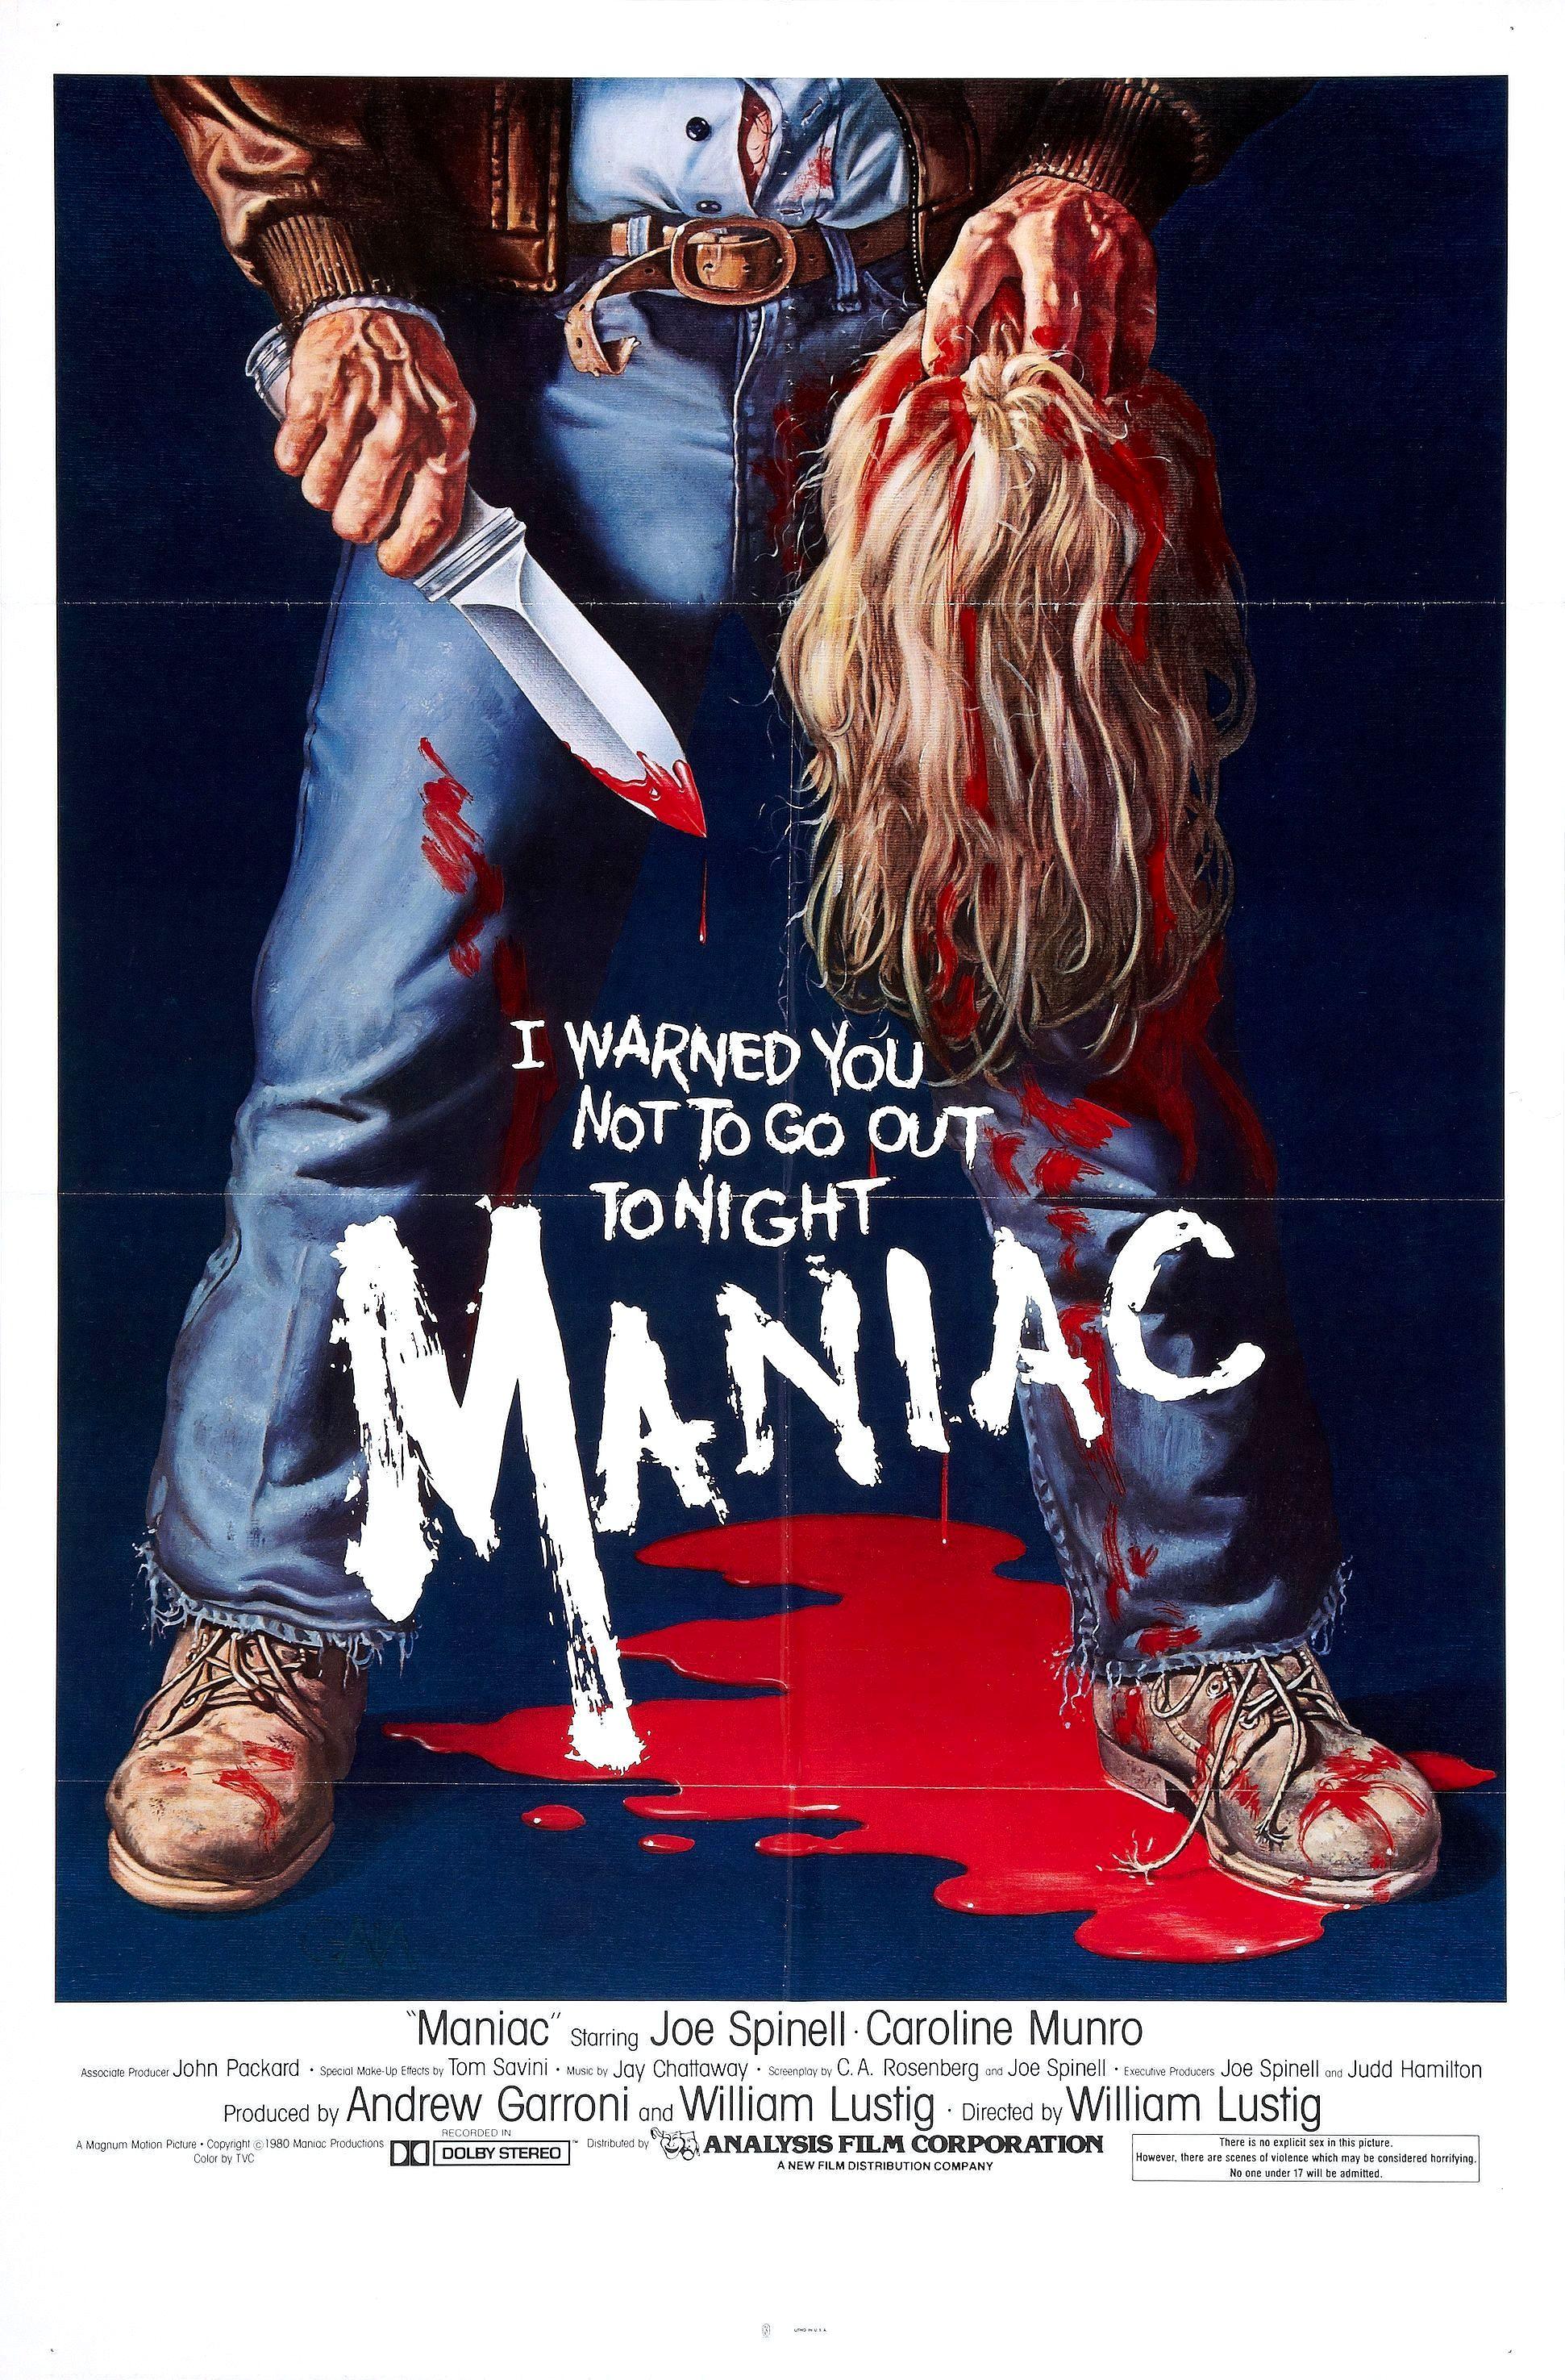 maniac-1980-poster.jpg